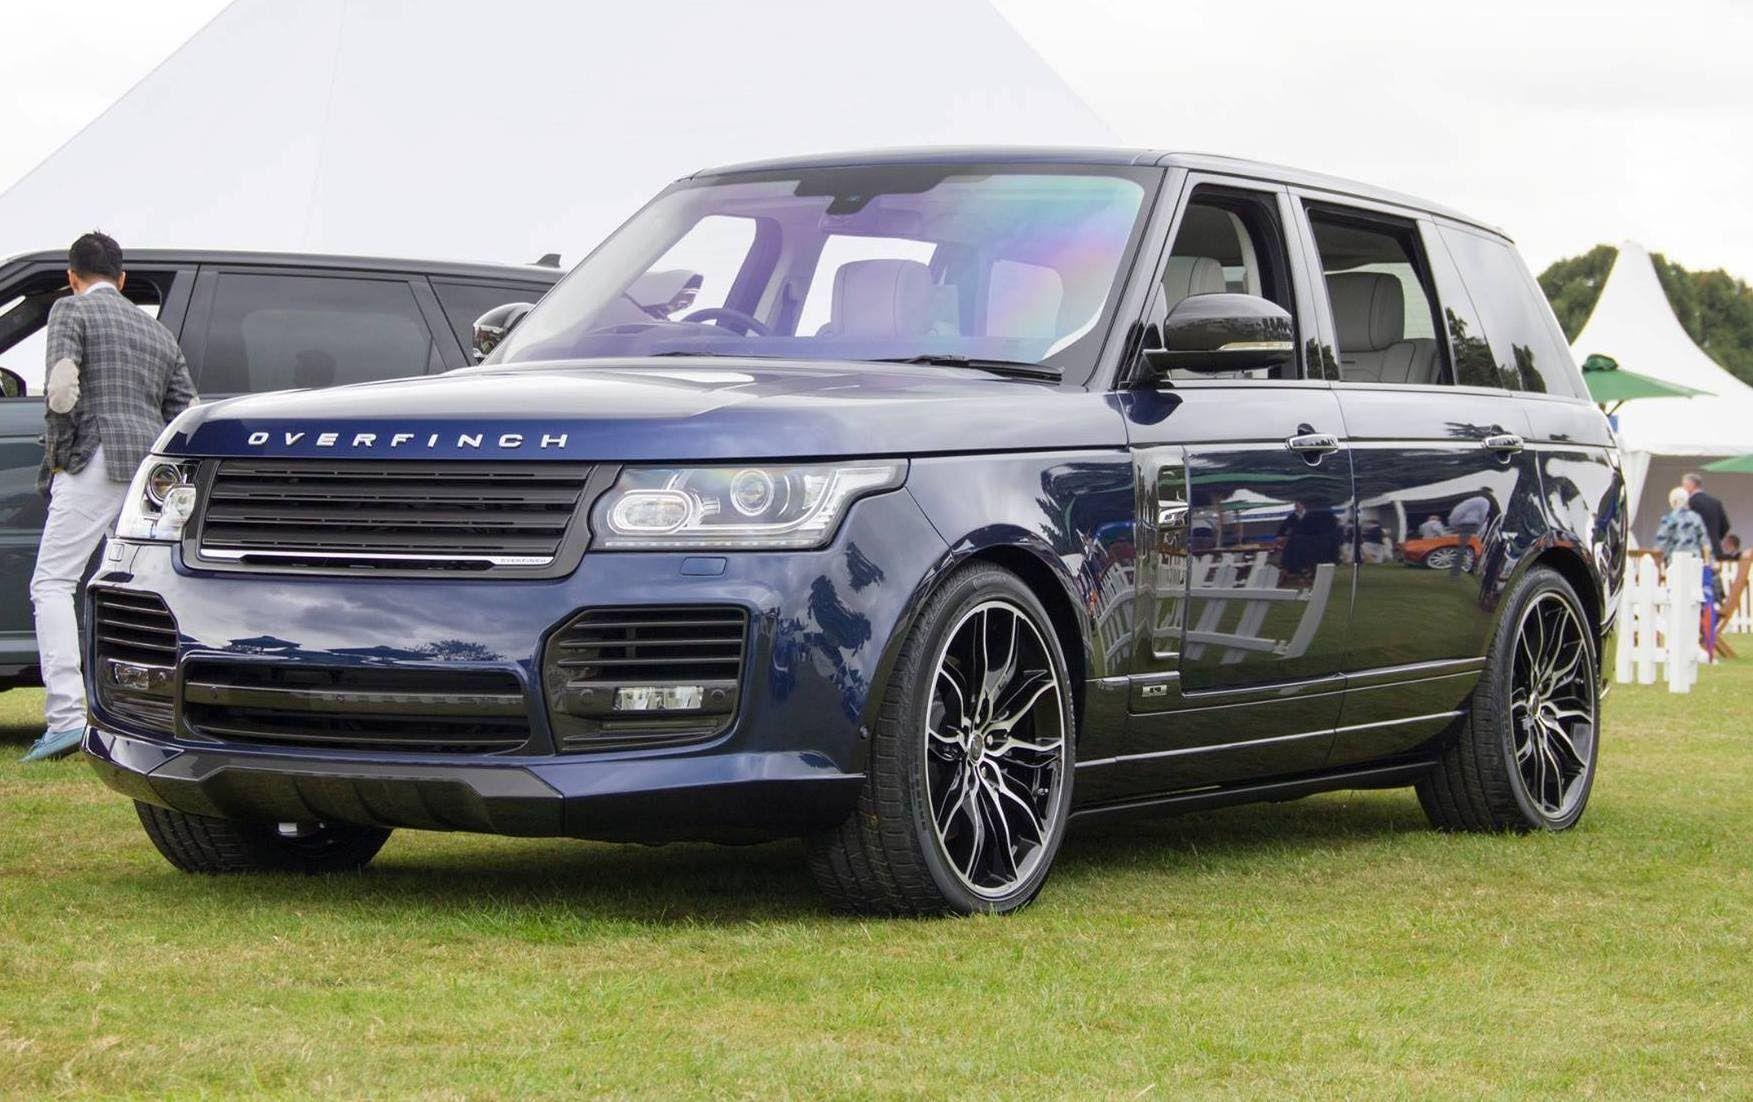 2016 Overfinch Range Rover Lwb Range Rover Supercharged Range Rover Lwb Range Rover